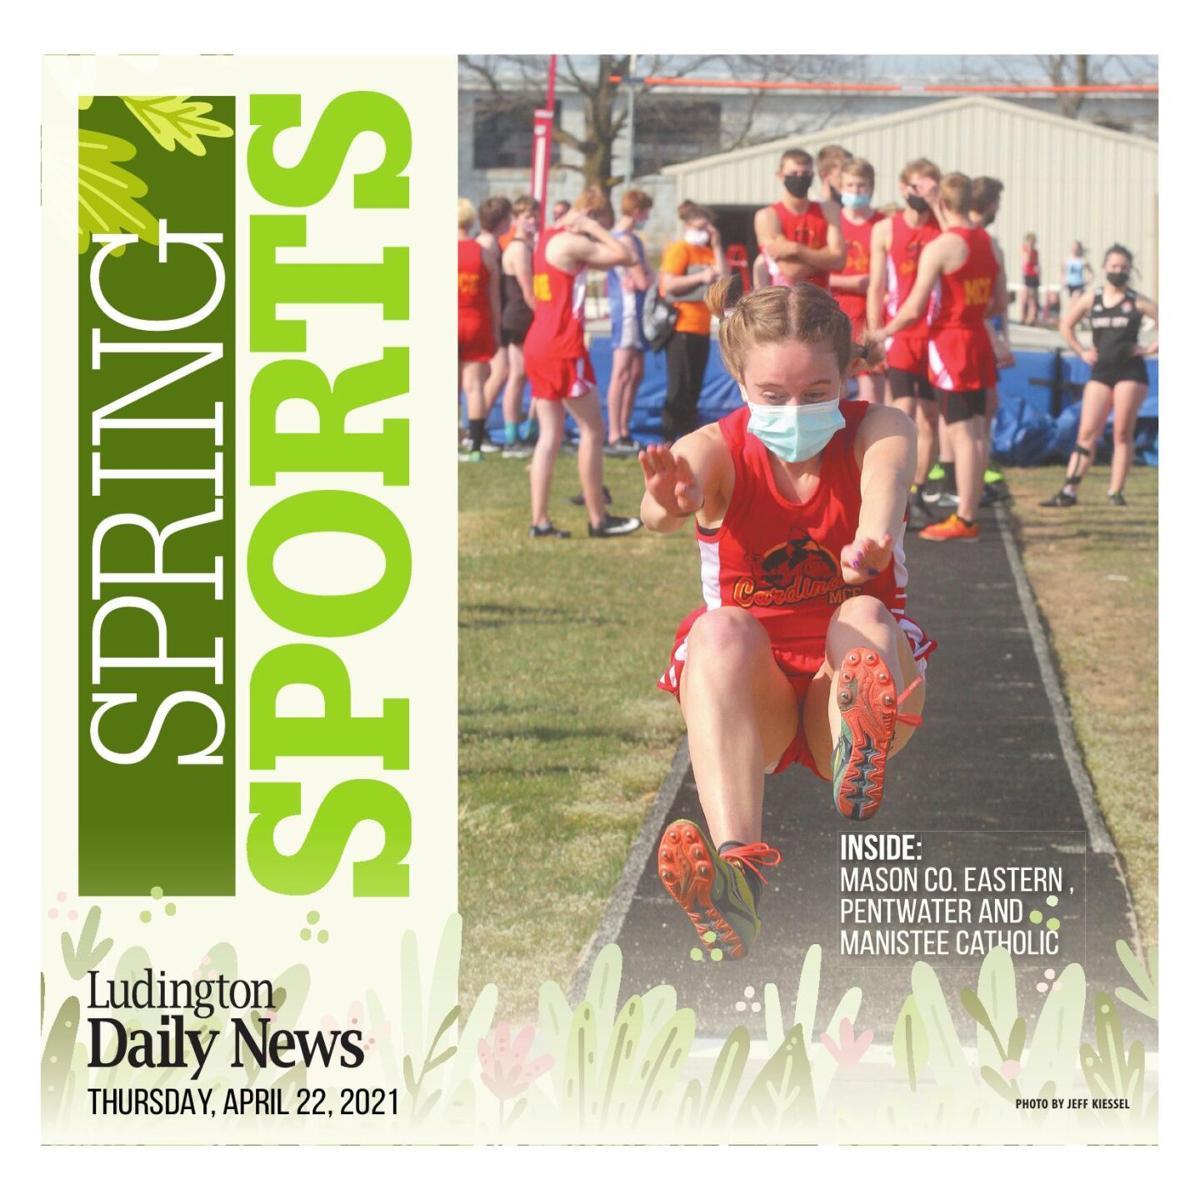 Spring Sports - MCE, Pentwater, Manistee Catholic